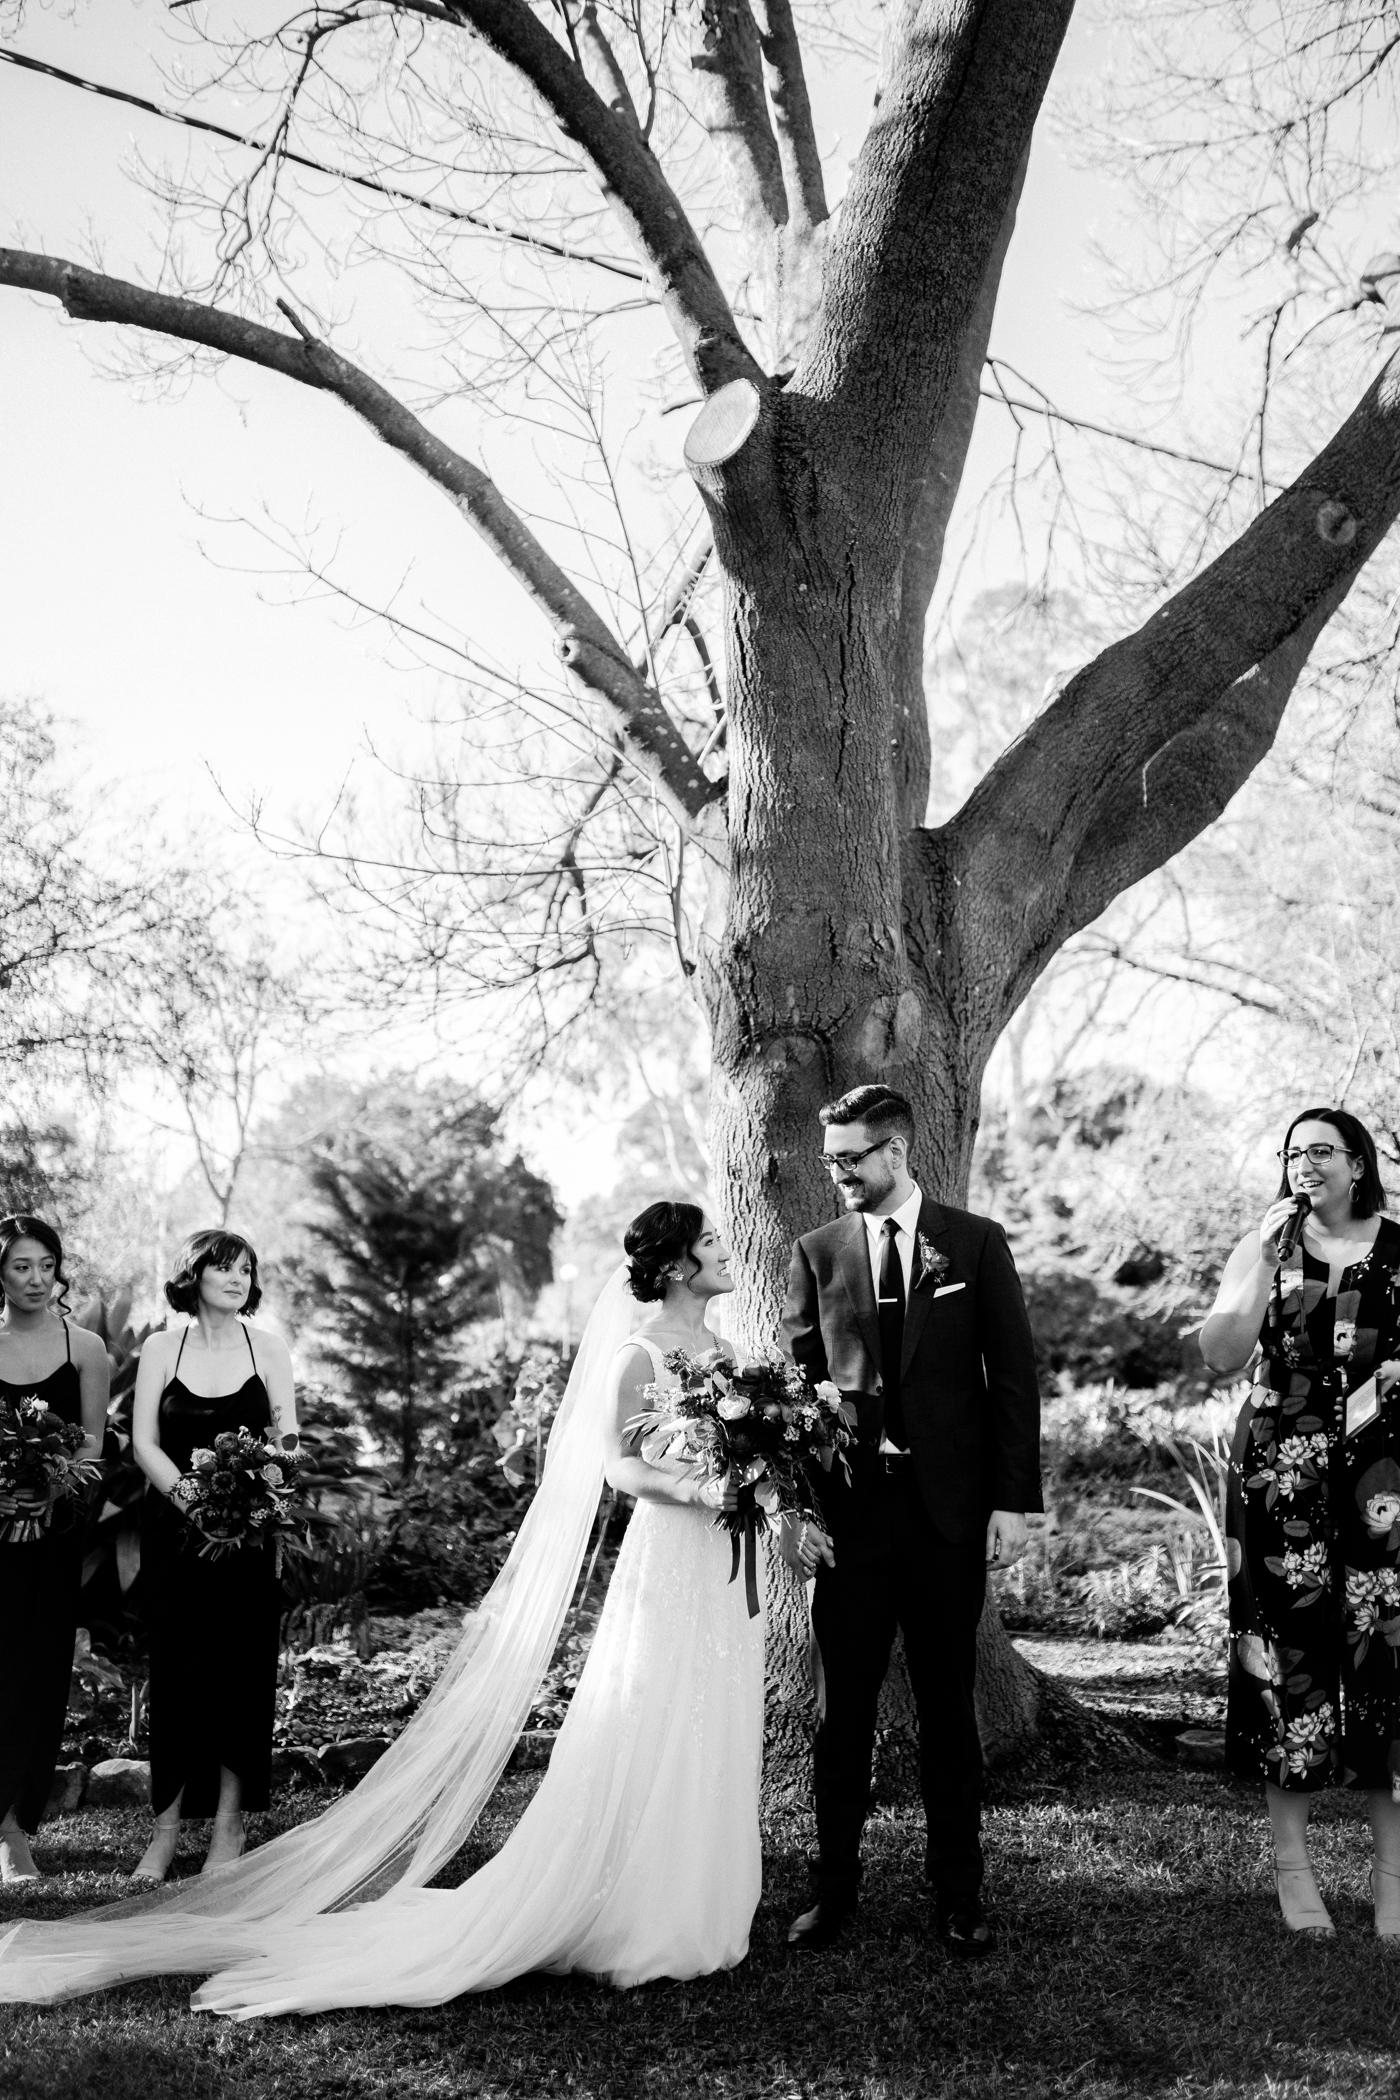 Adelaide Wedding Photographer - Al Ru Farm Wedding in Adelaide - Natural Wedding Photography Australia - www.katherineschultzphotography.com - Todd & Rachel_0036.jpg